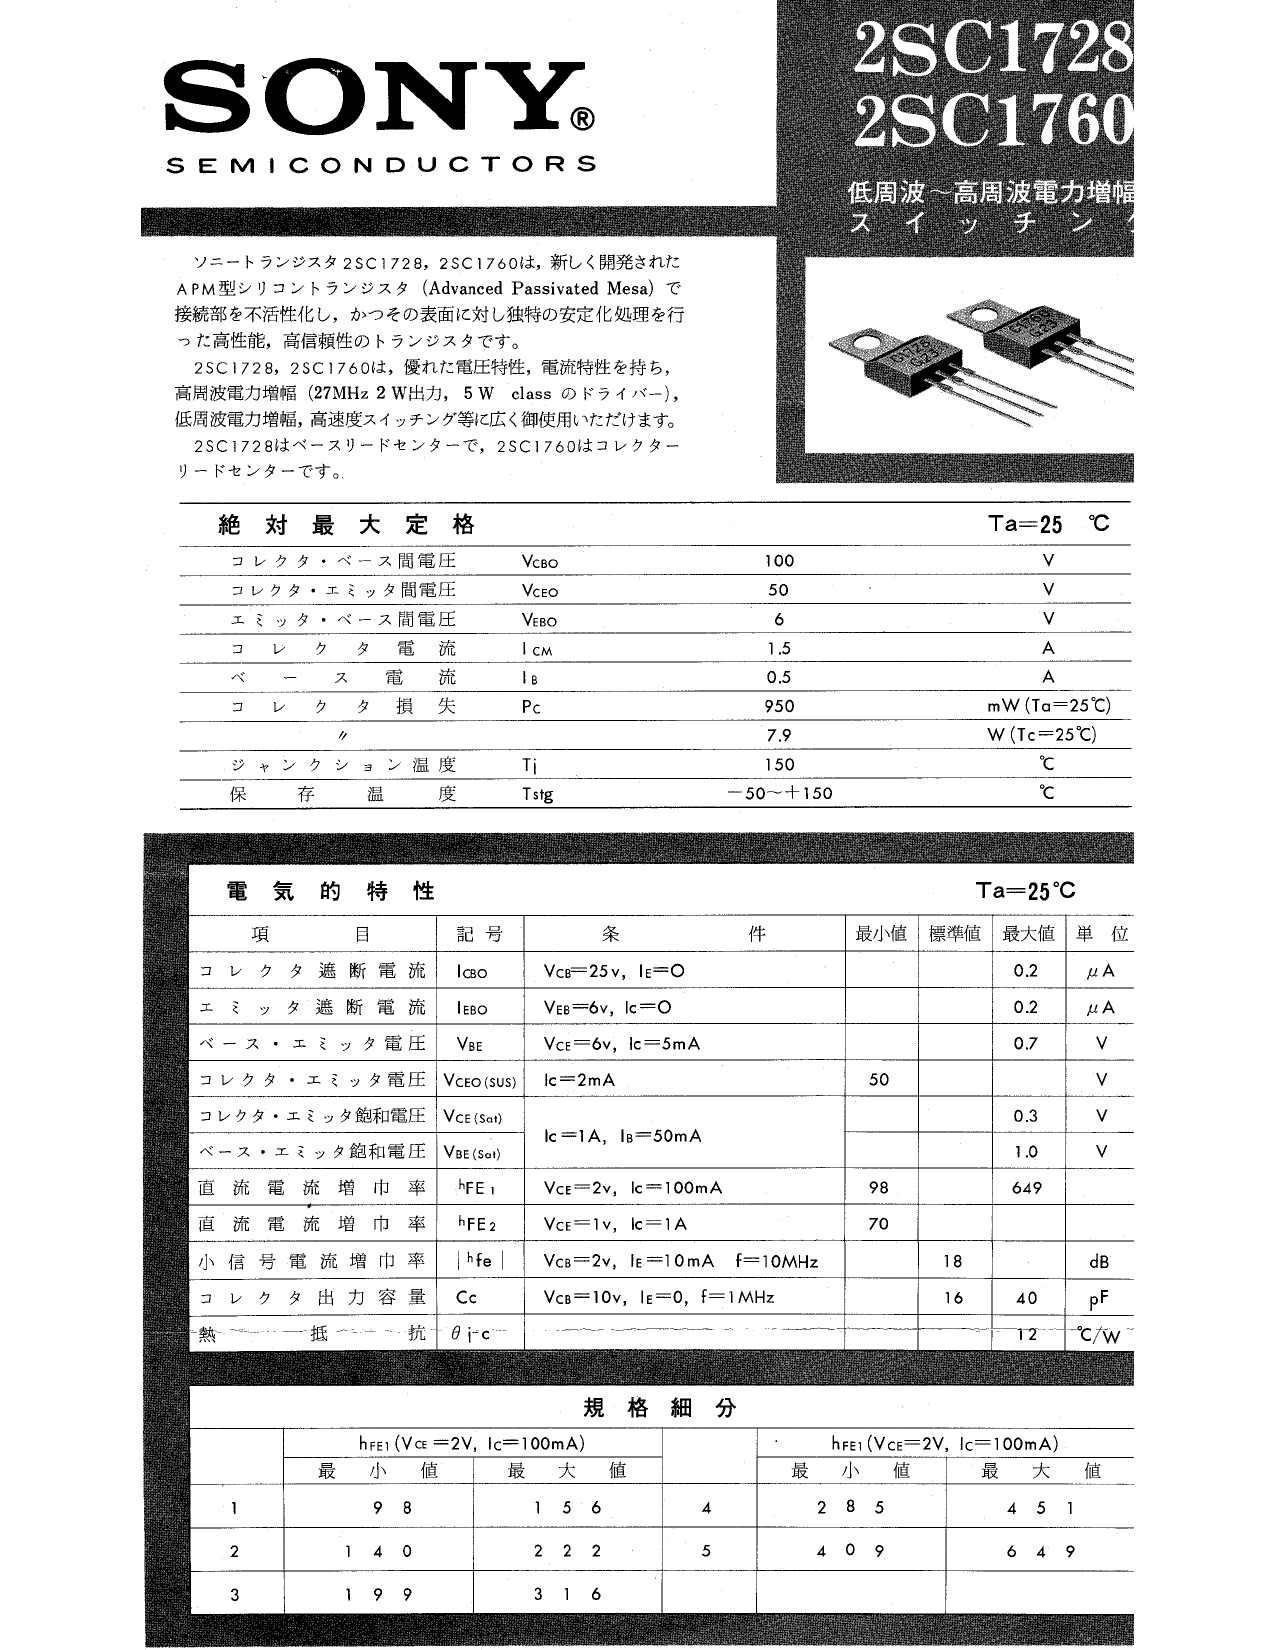 2SC1760 datasheet